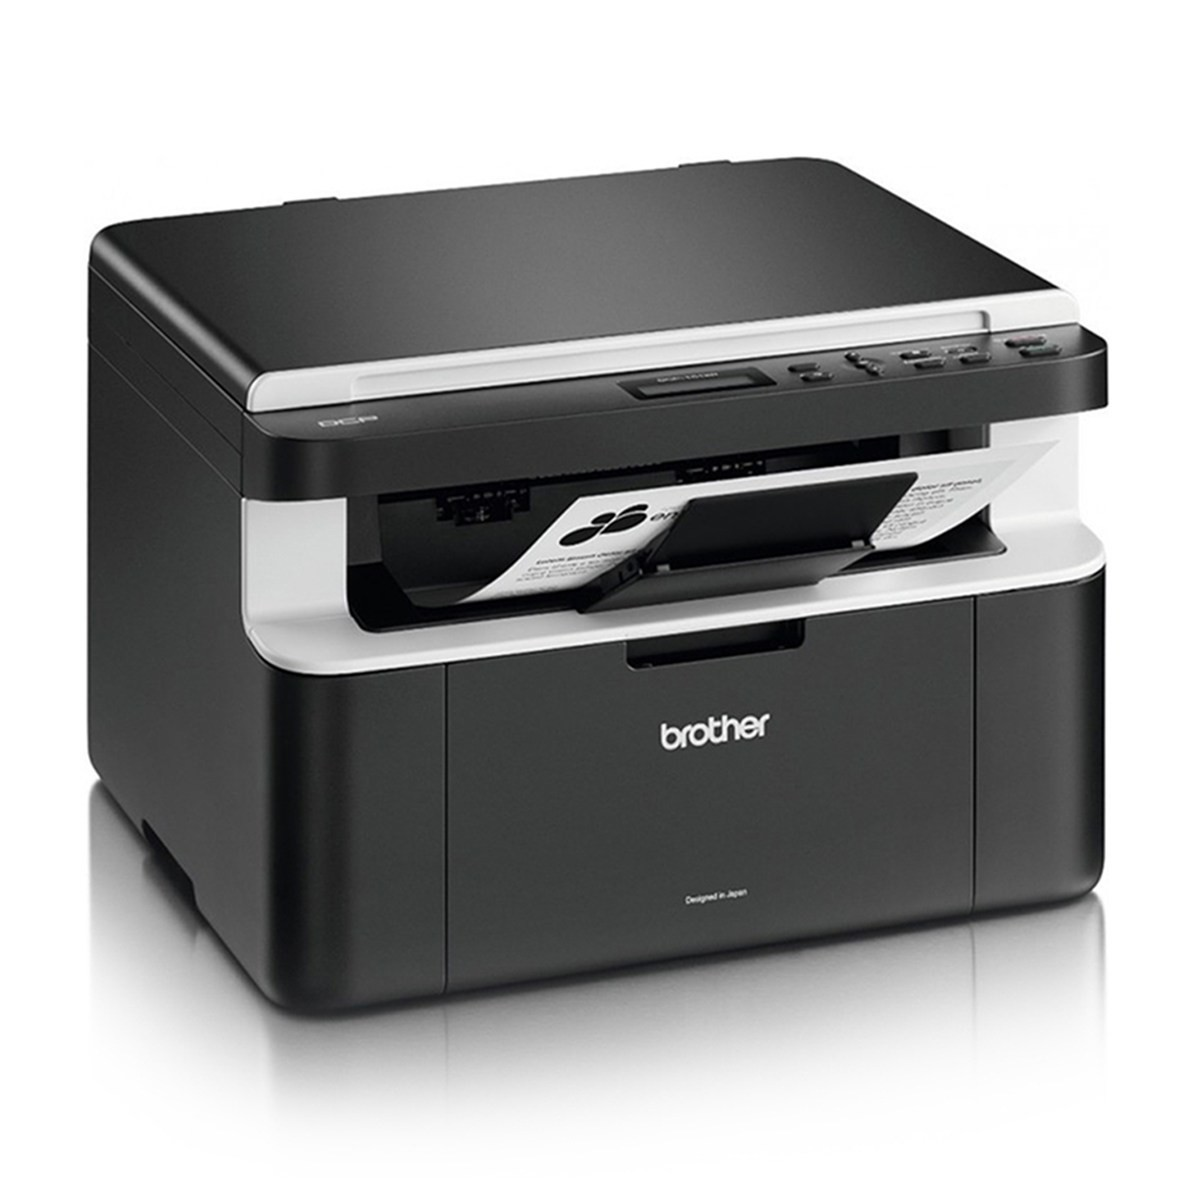 Impressora Multifuncional Brother DCP1602 Laser Mono